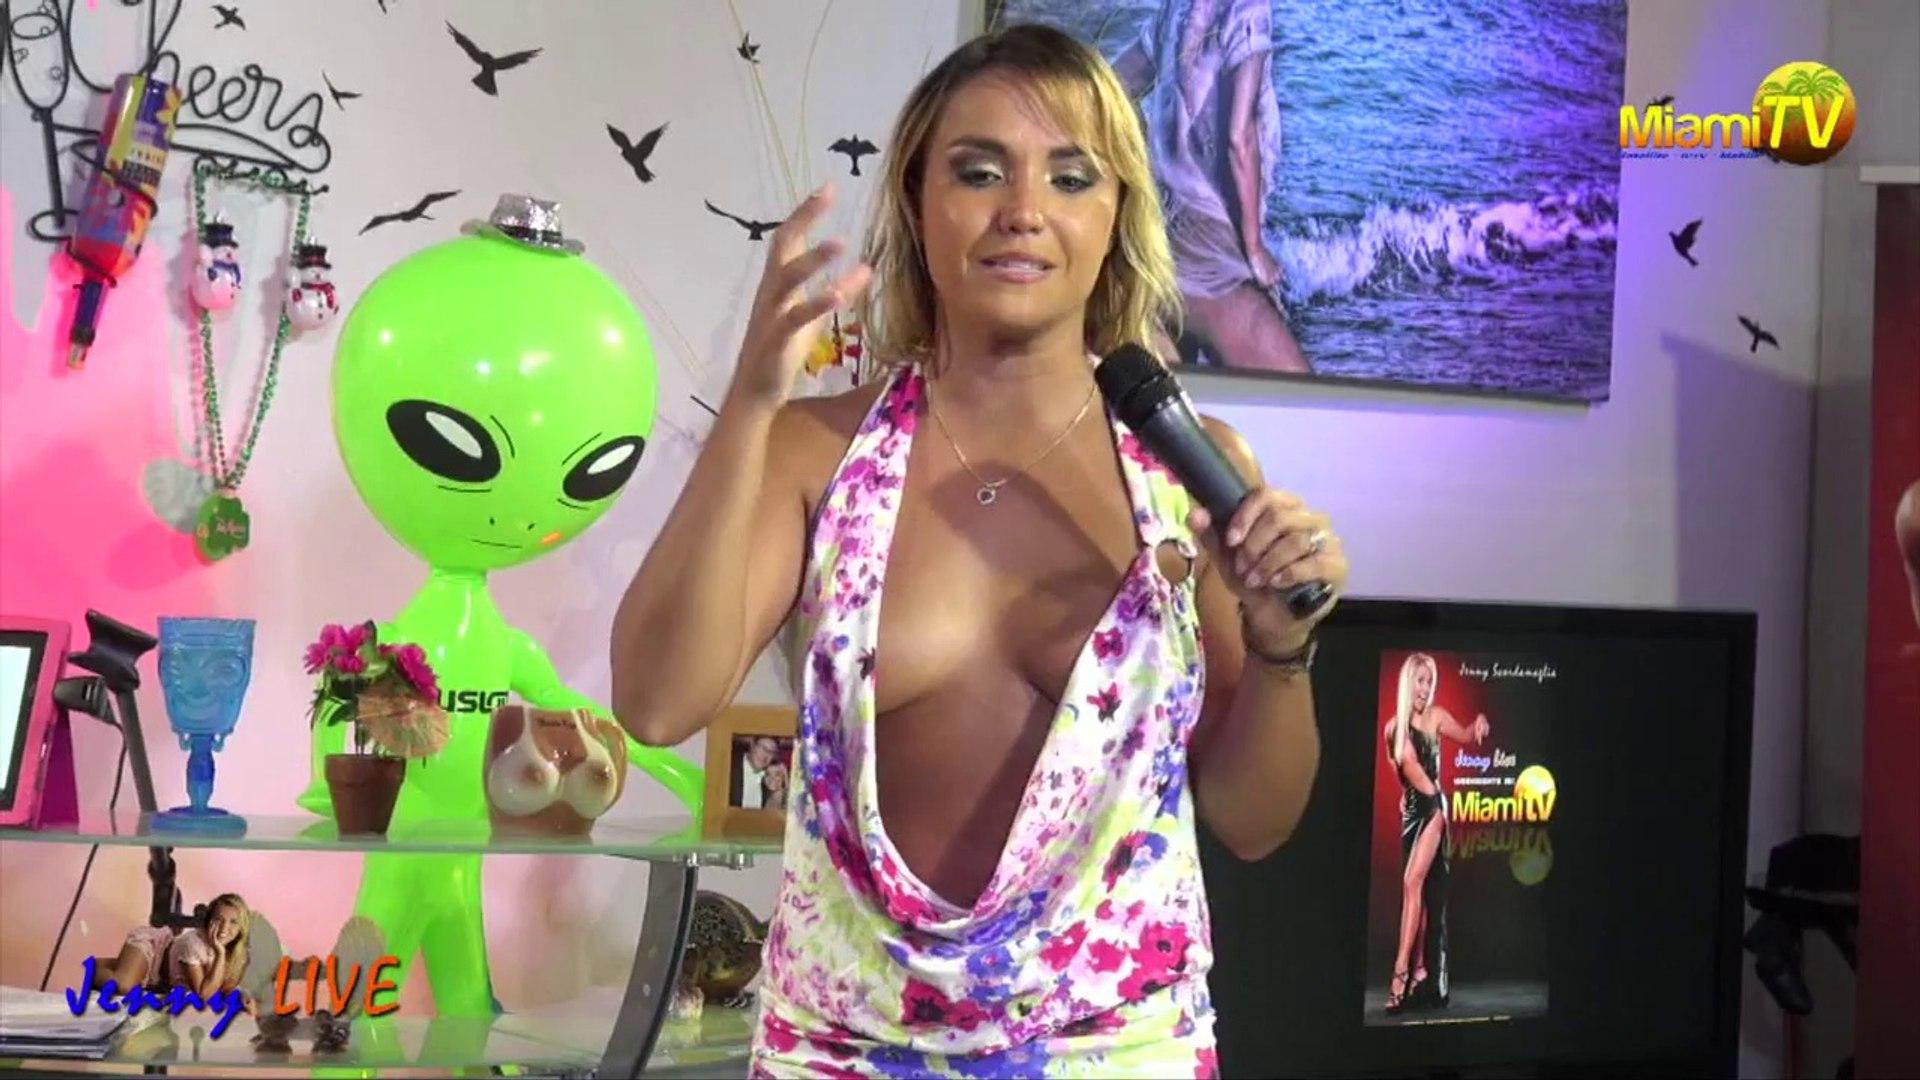 Jenny Miami Tv Topless jenny live 517 - addictions - jenny scordamaglia - miami tv